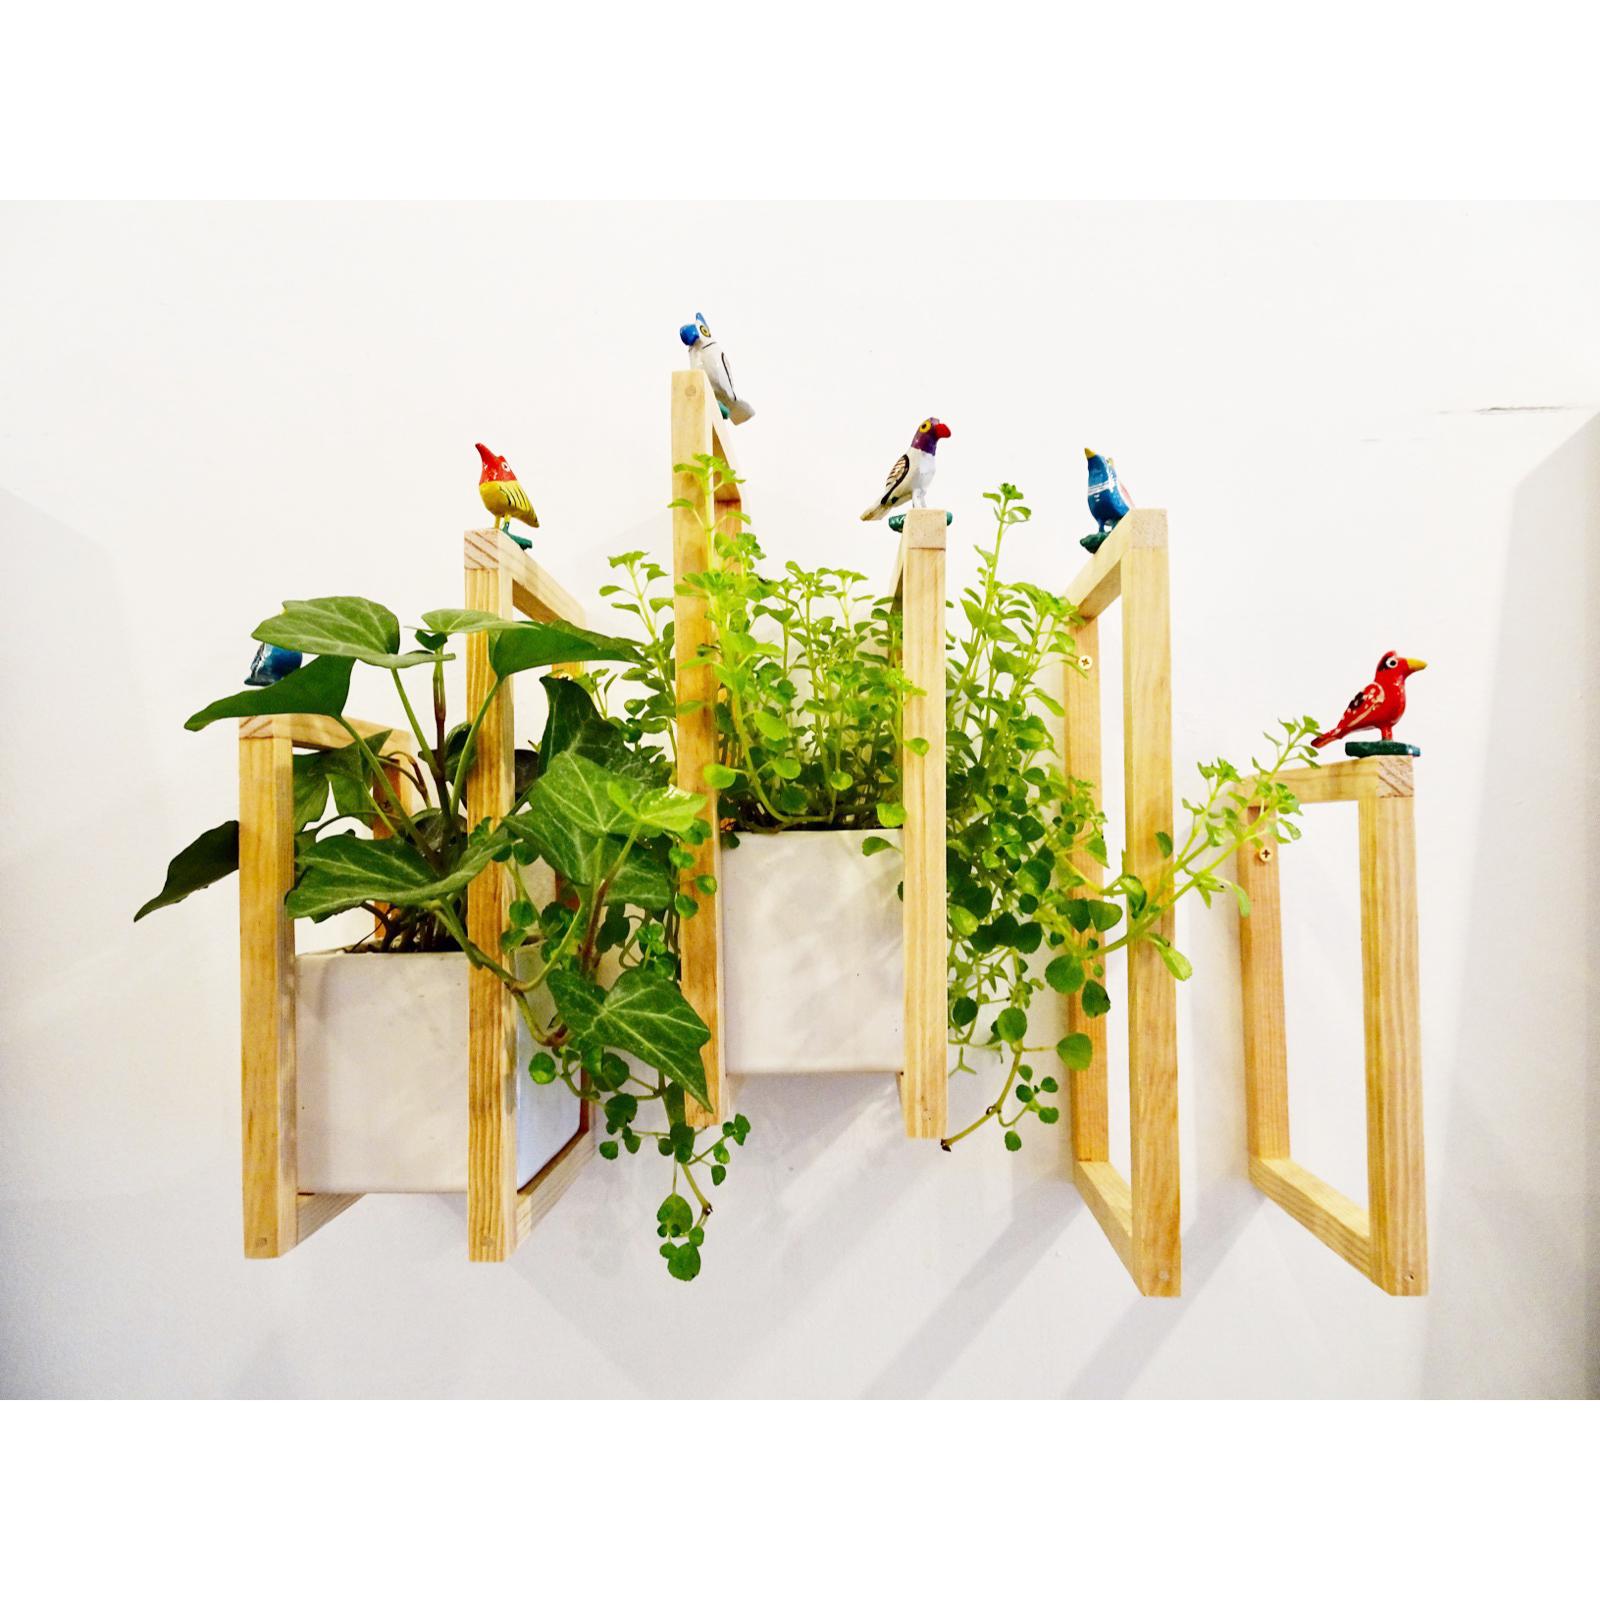 Wall Mounted Planter with Frames by Non Matsuura